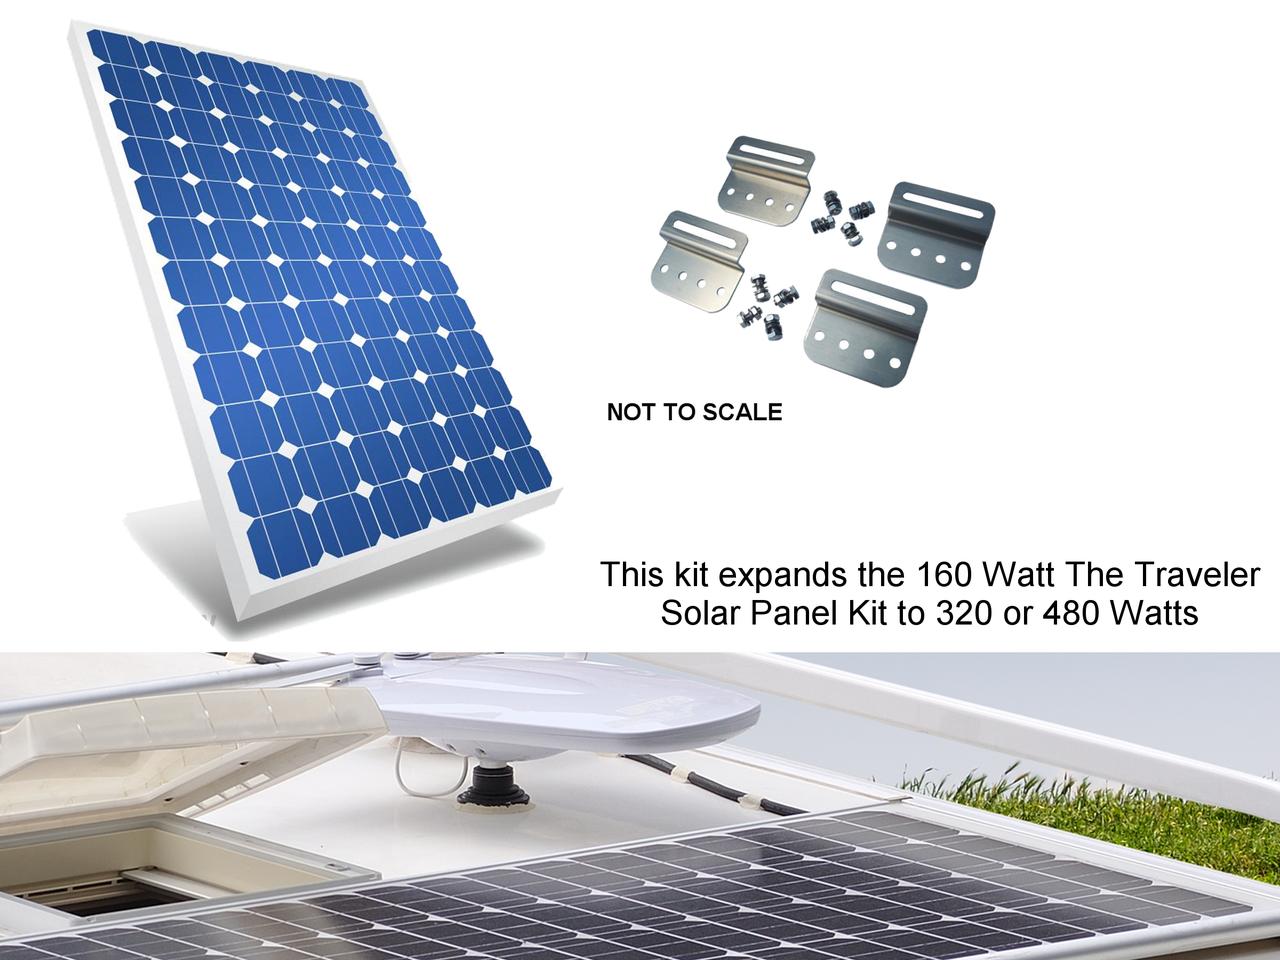 Mr. Solar® DIYPower The Traveler EK 160 Watt, Expansion Kit for The Traveler Solar Panel Kit (TRVLR-160)